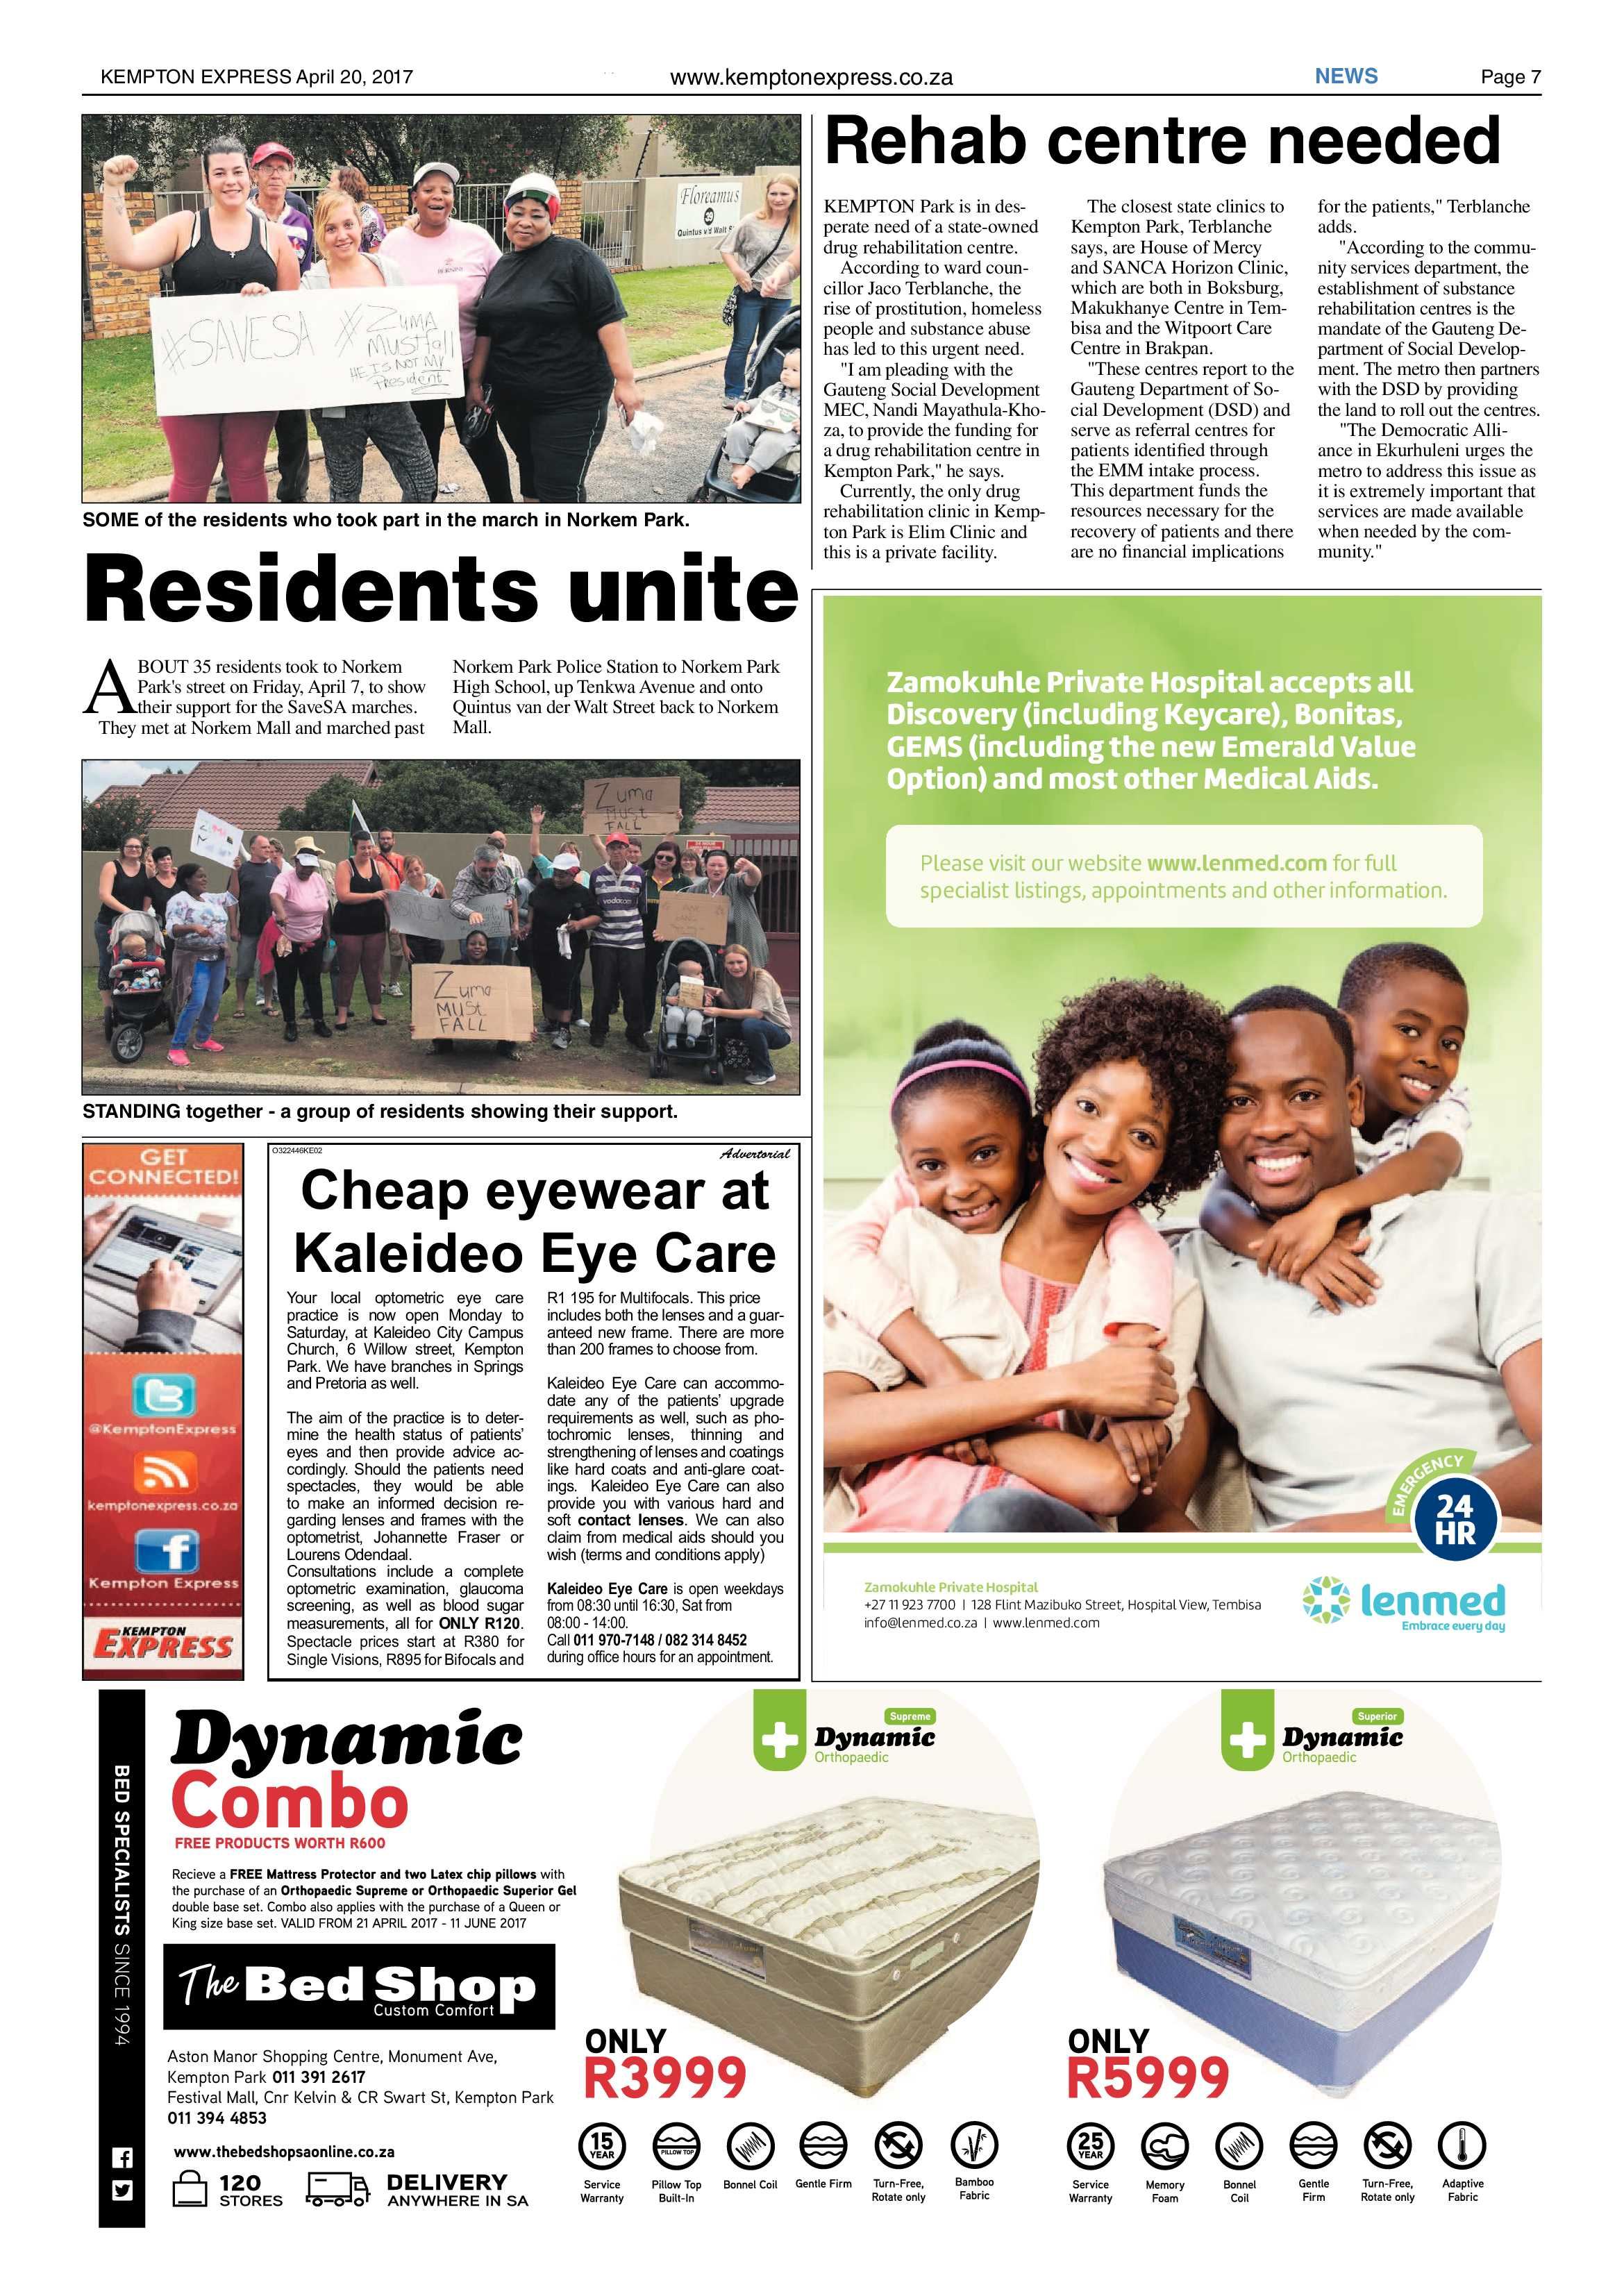 kempton-express-20-april-2017-epapers-page-7